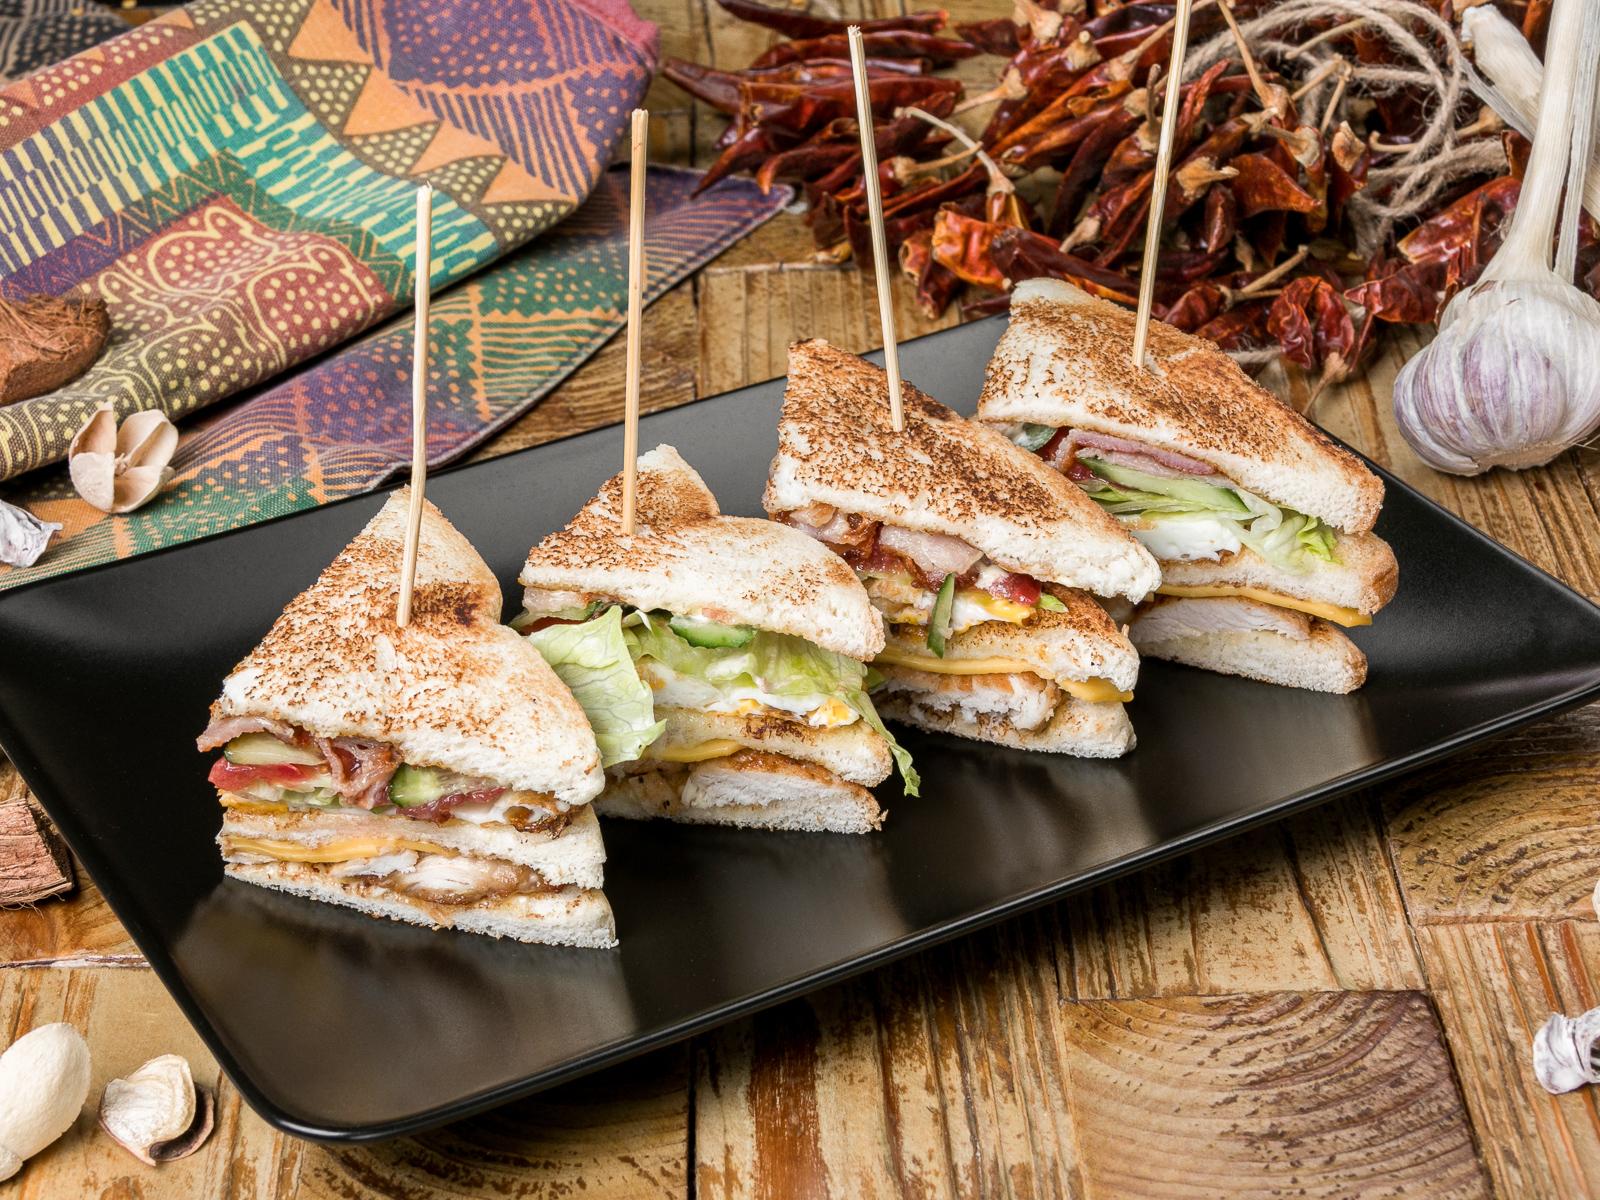 Клаб сэндвич с куриной грудкой